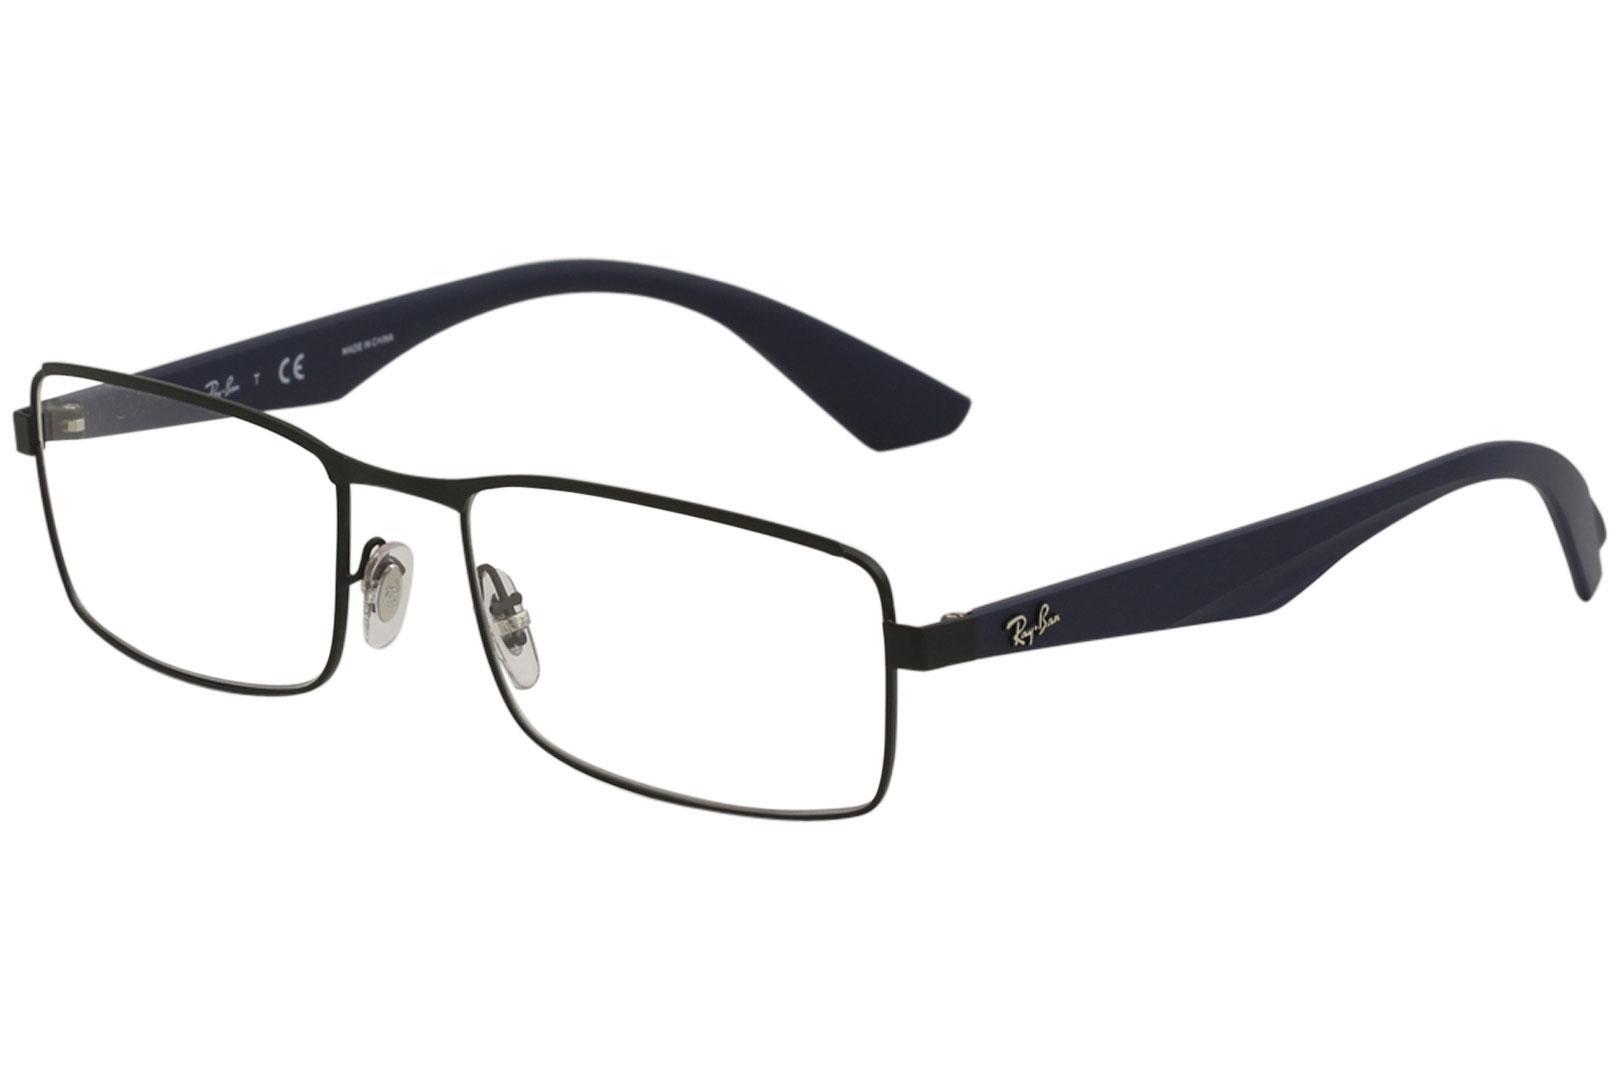 072e7e347a1 Ray Ban Eyeglasses RX6332 RX 6332 RayBan 2503 Matte Black Optical ...